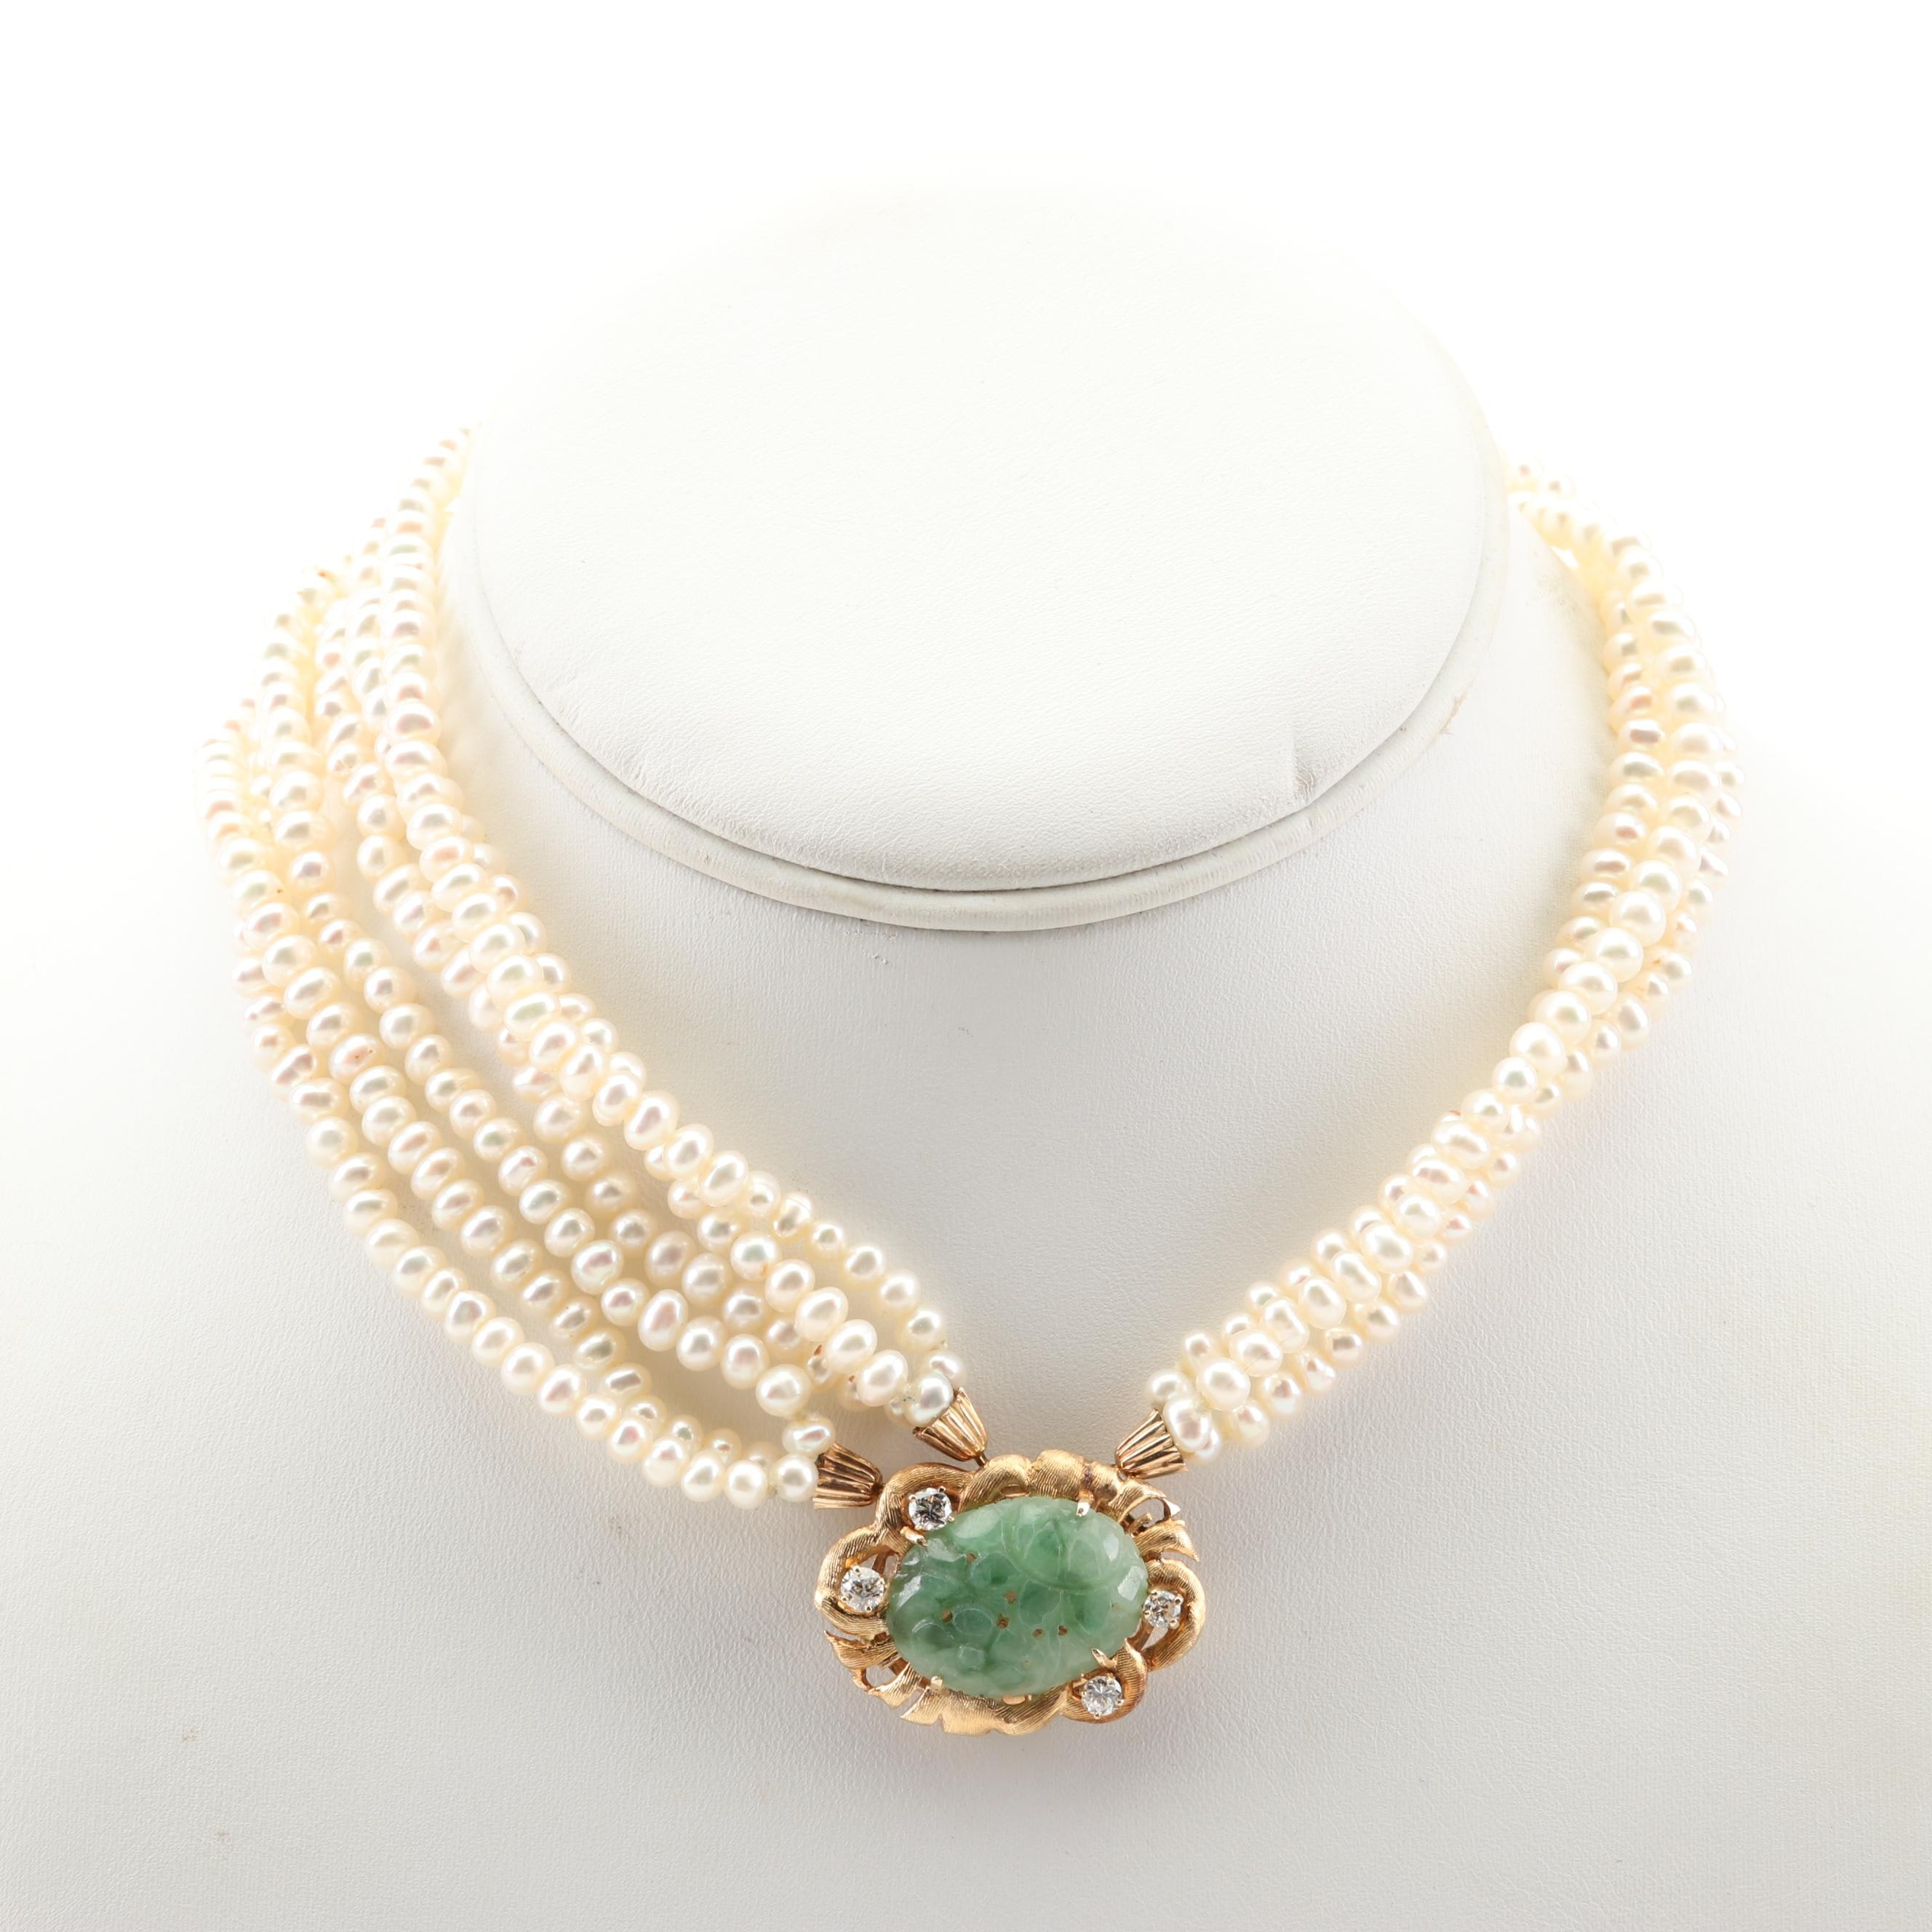 14K Yellow Gold Freshwater Pearl, Jadeite and Diamond Bracelet